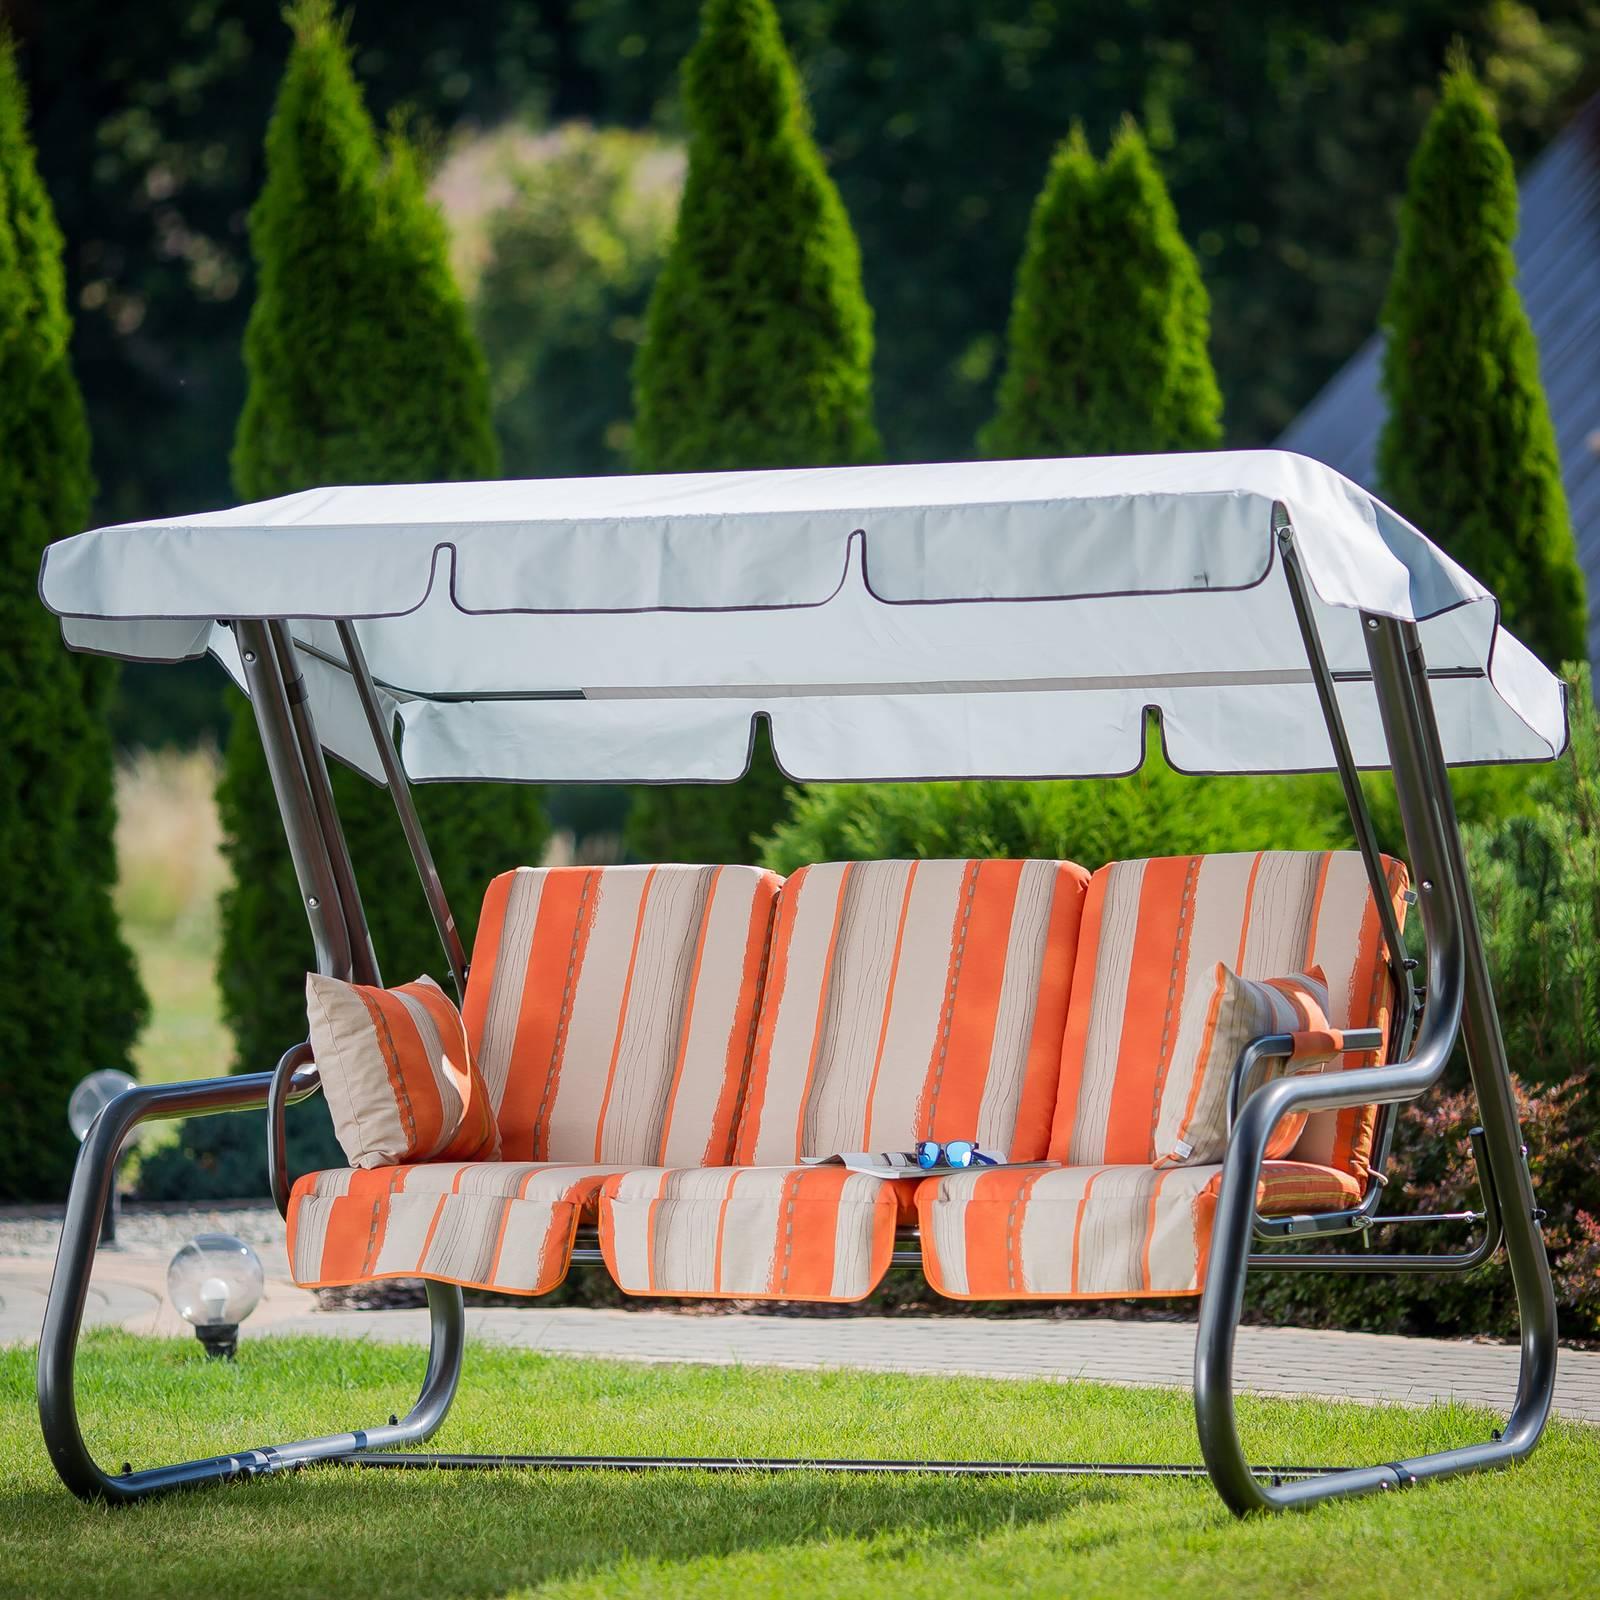 Replacement garden swing cushions 180 cm Rimini / Venezia C019-13LB PATIO